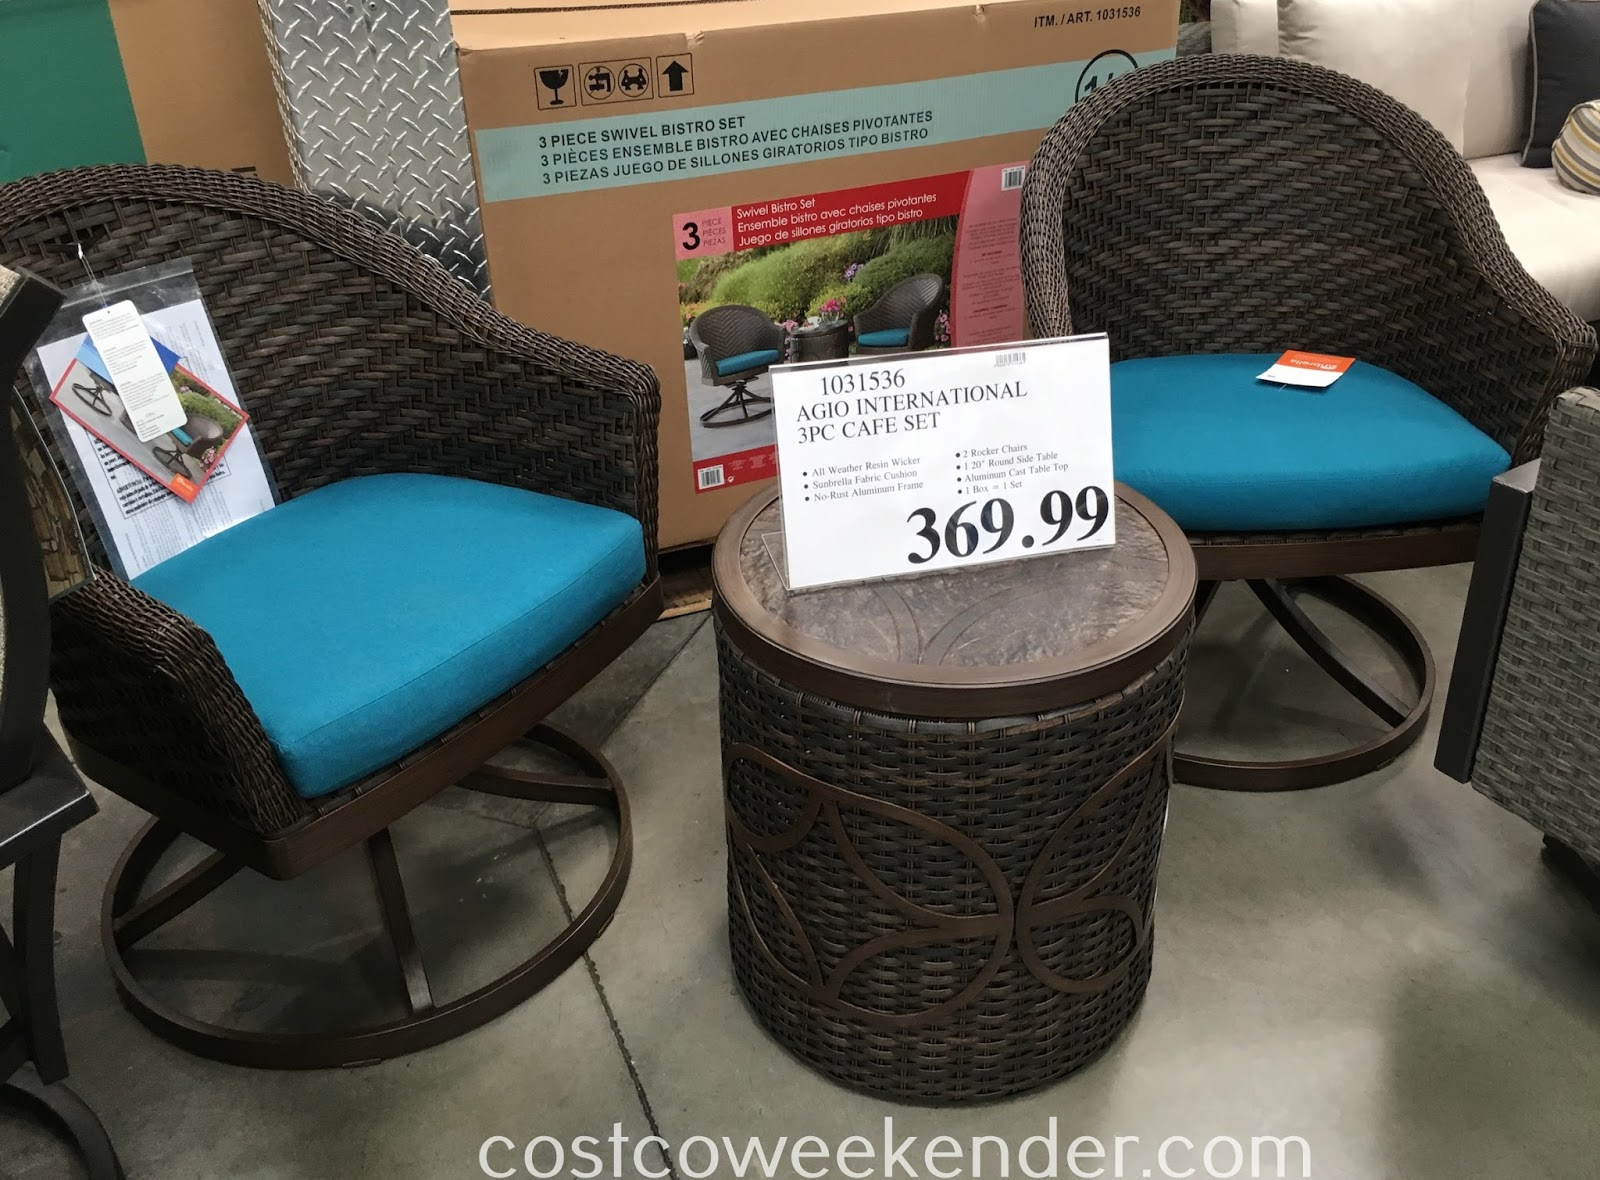 Superb Agio International 3 Piece Swivel Bistro Set Costco Weekender Ibusinesslaw Wood Chair Design Ideas Ibusinesslaworg